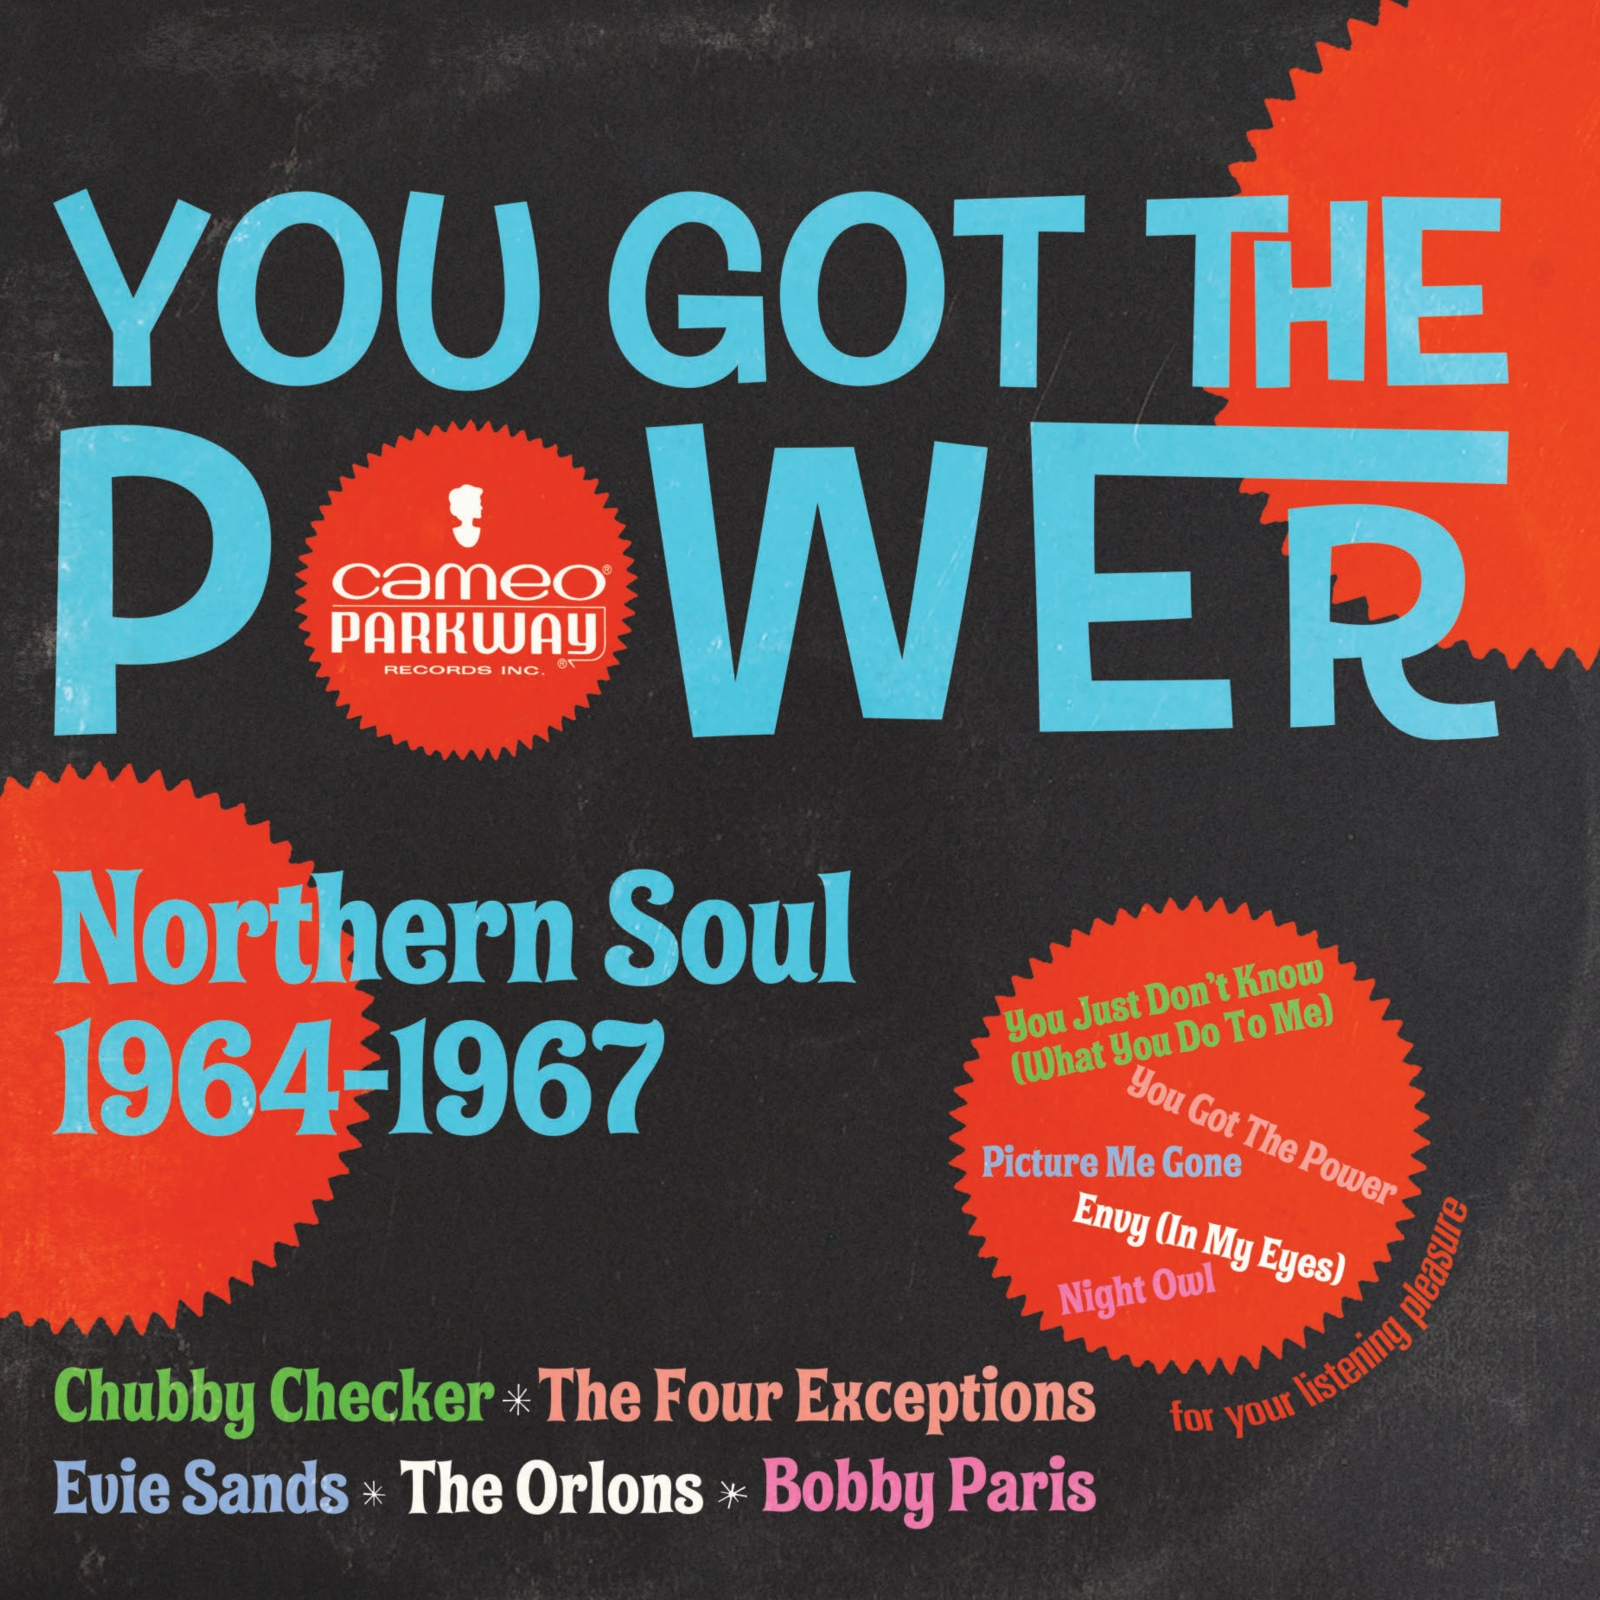 You Got The Power: Northern Soul (1964-1967) - Vinyl